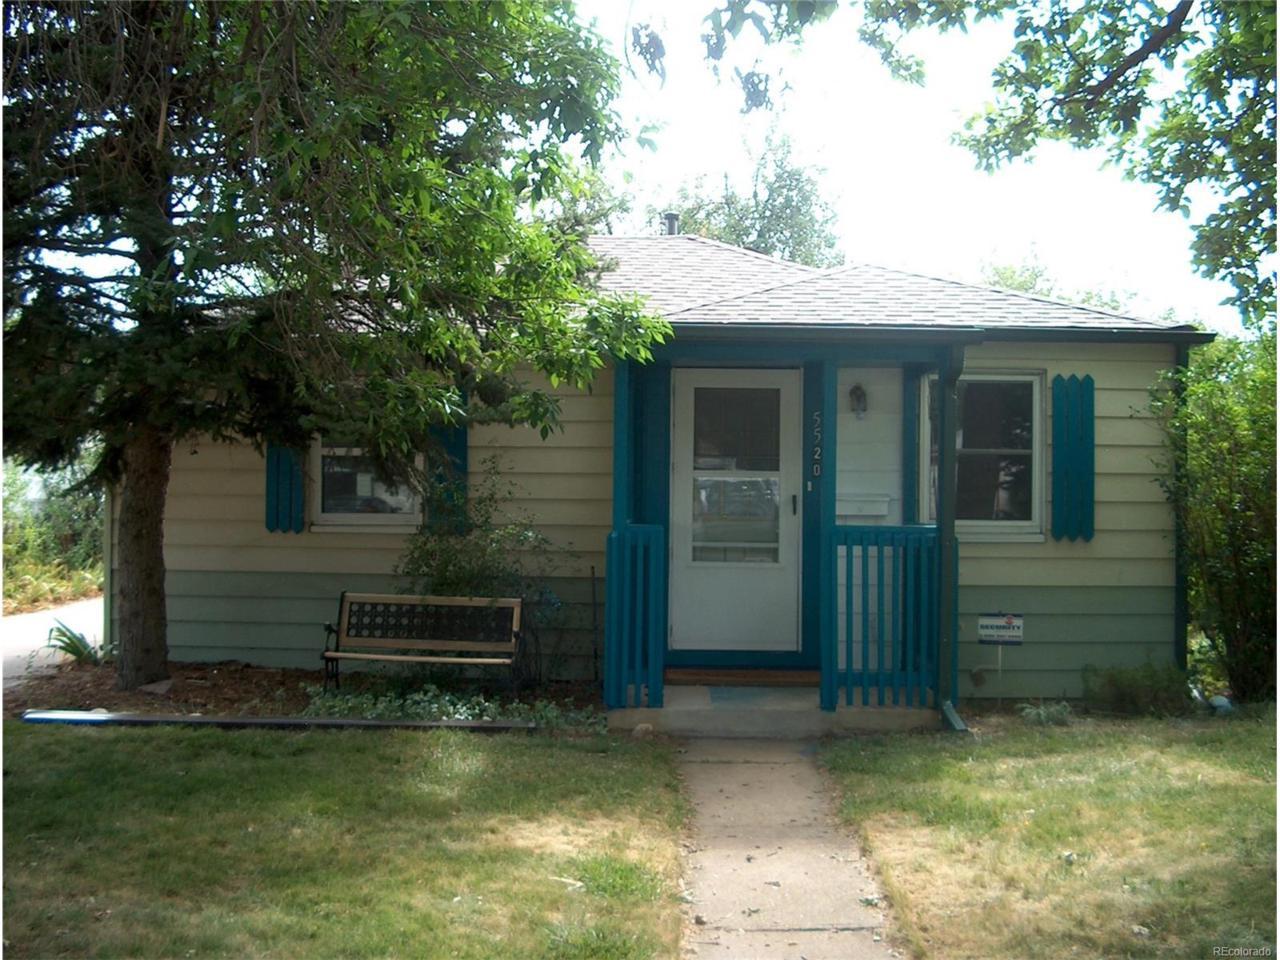 5520 Otis Court, Arvada, CO 80002 (MLS #8015824) :: 8z Real Estate